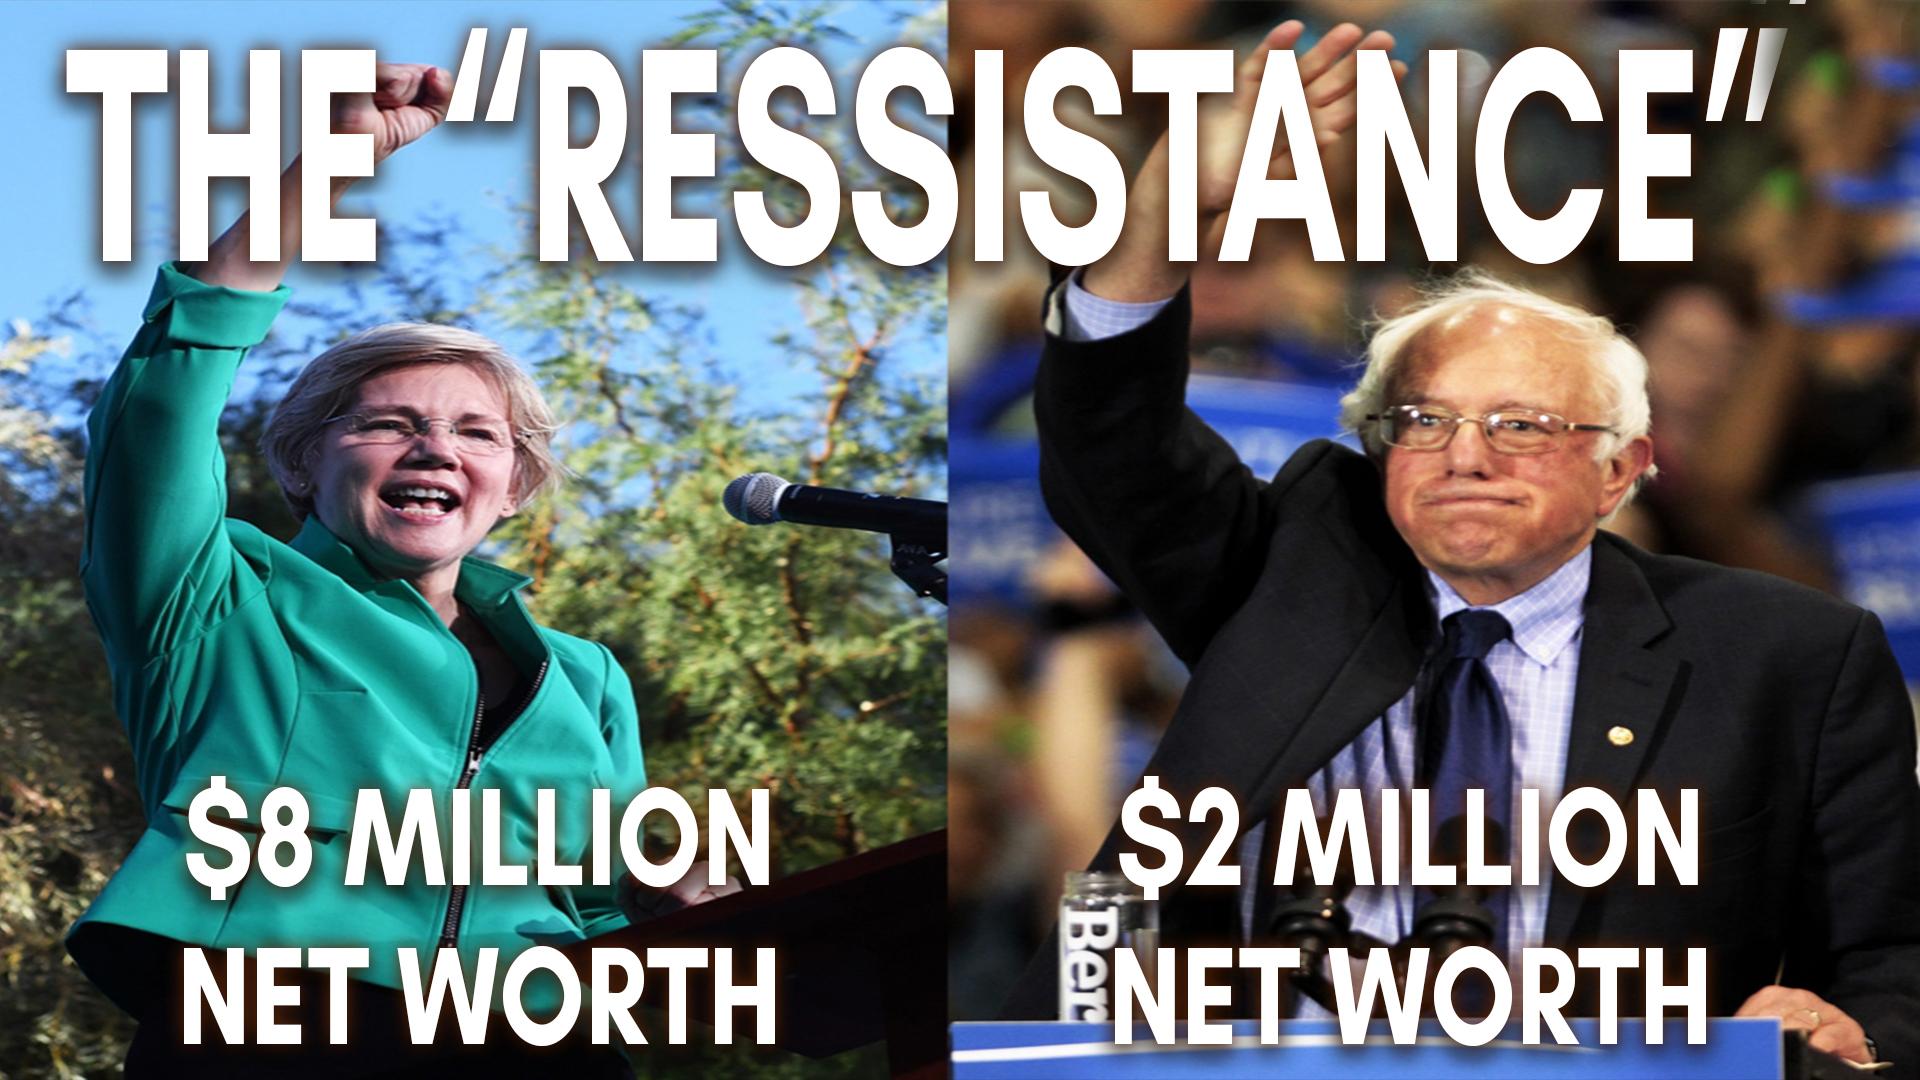 net worth.jpg